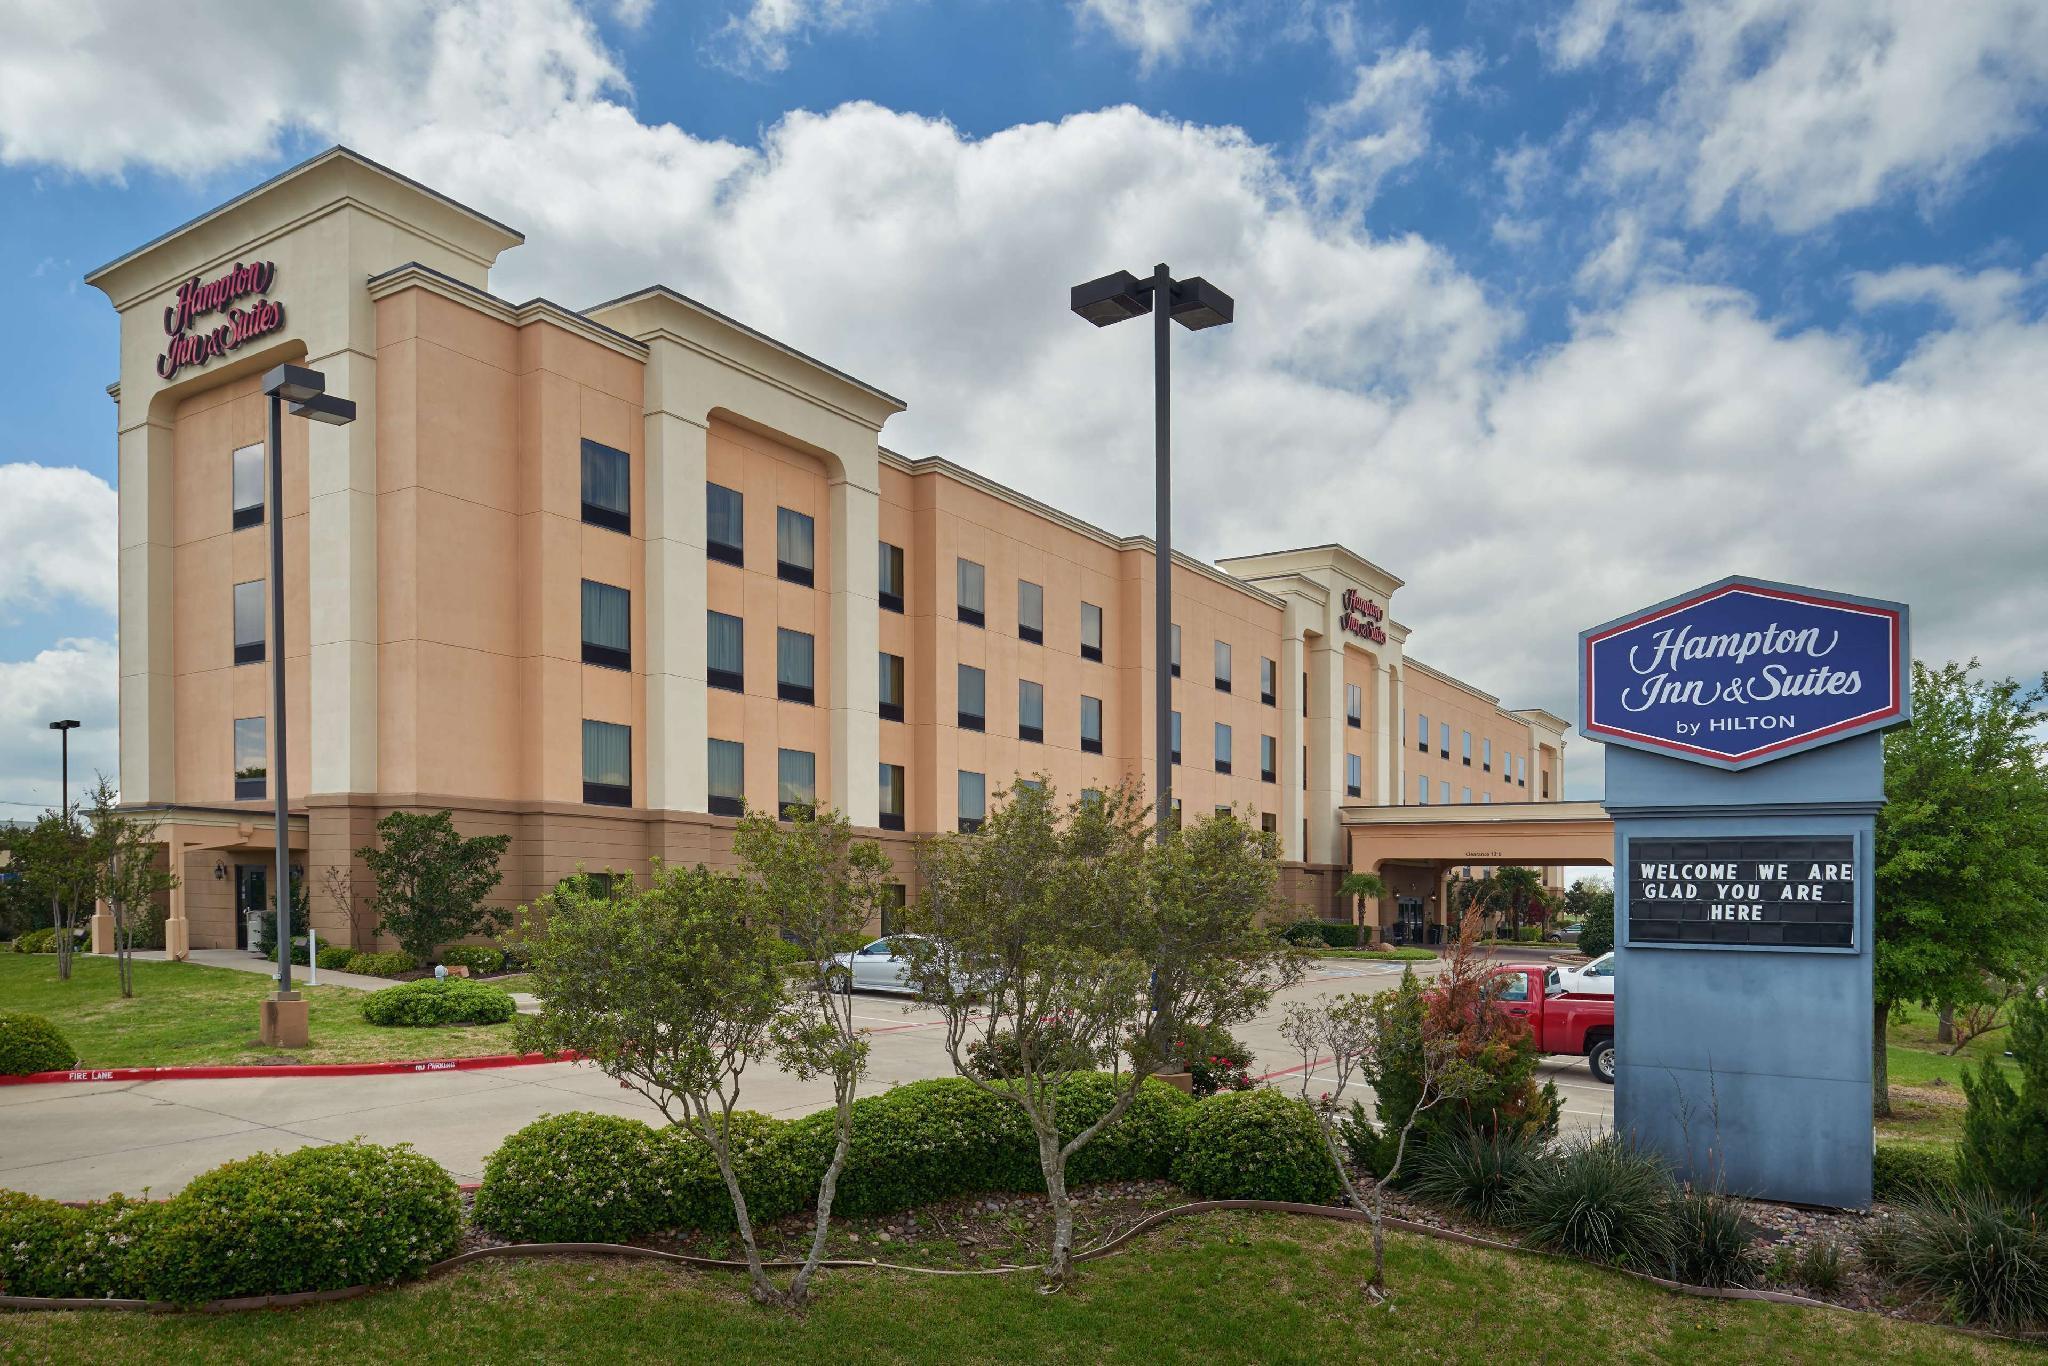 Hampton Inn And Suites Waco South